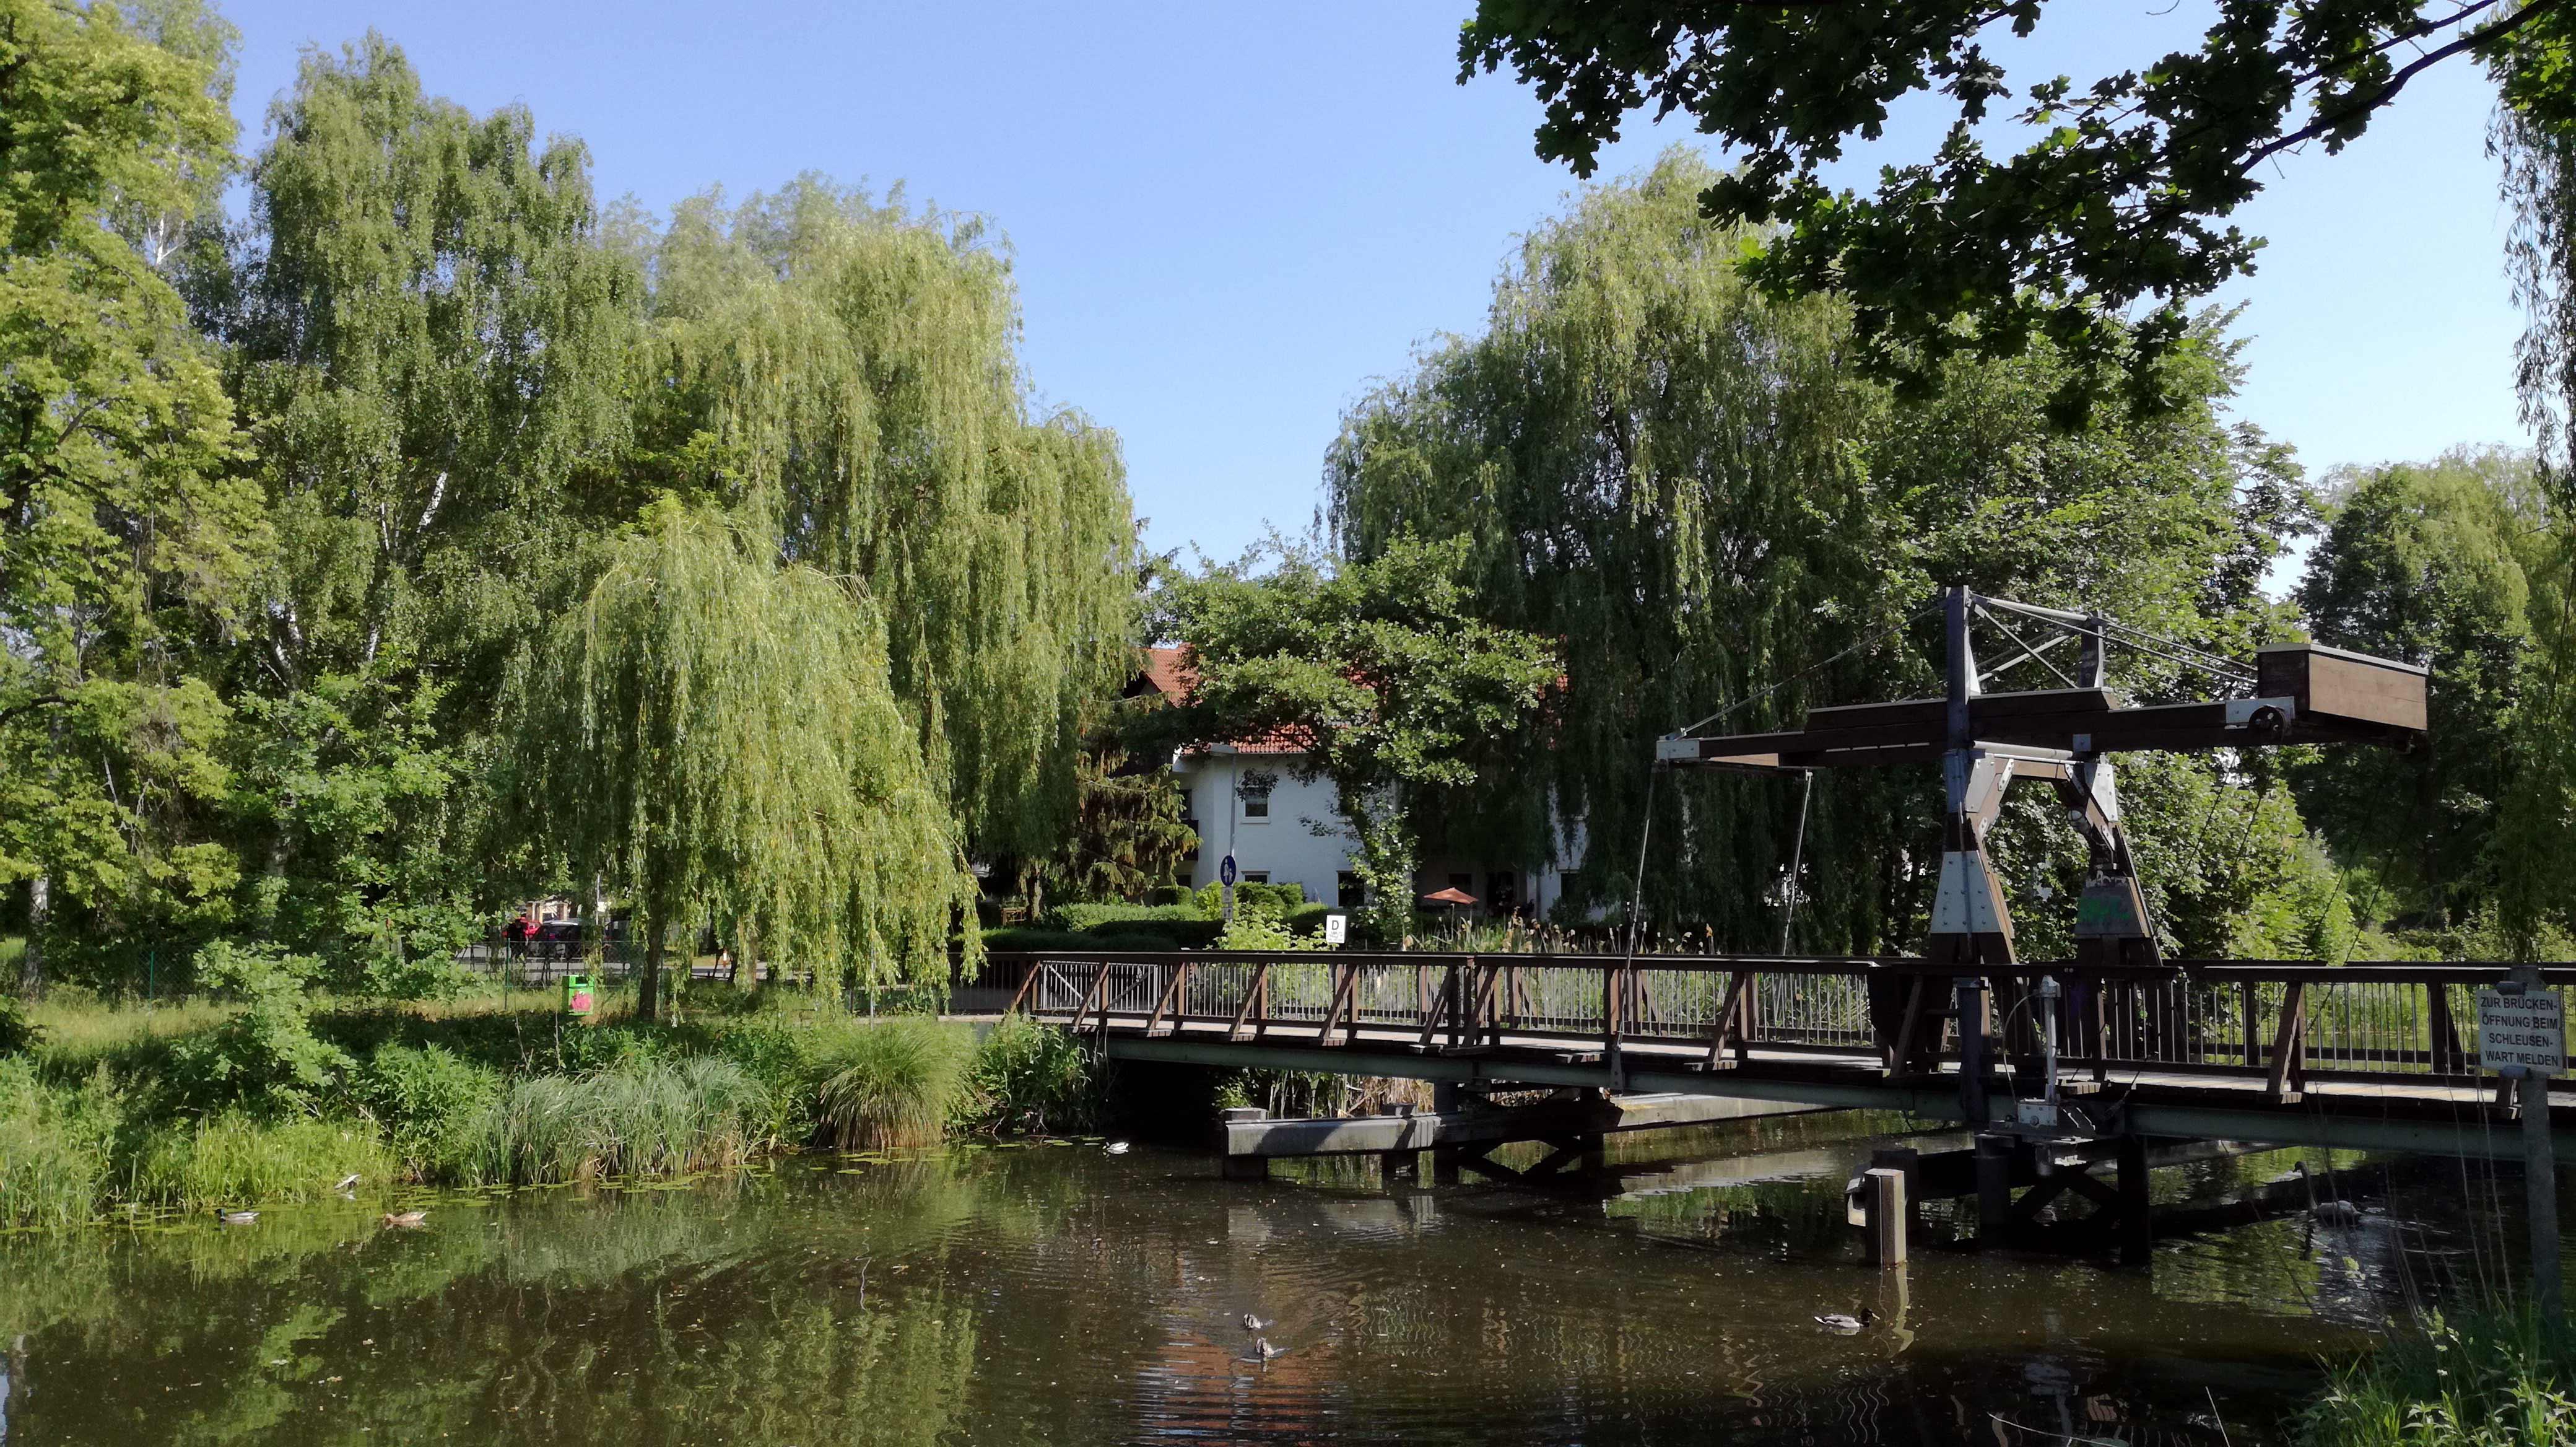 Historisches Idyll: Alte Kipp-Brücke über dem Nottekanal |Johannes Ulrich Gehrke